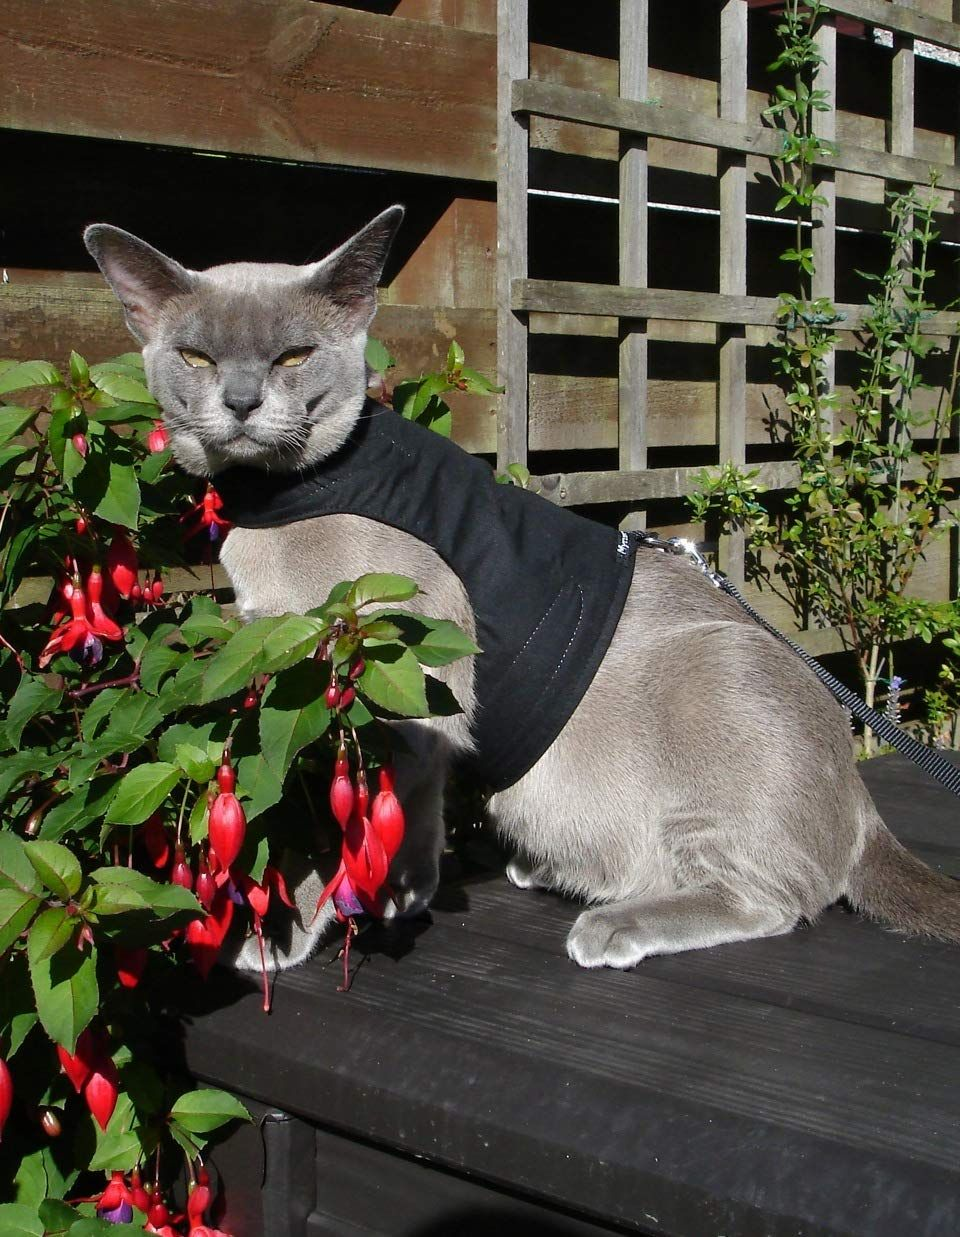 Mynwood Cat Jacket/Harness Black Adult Cat Escape Proof